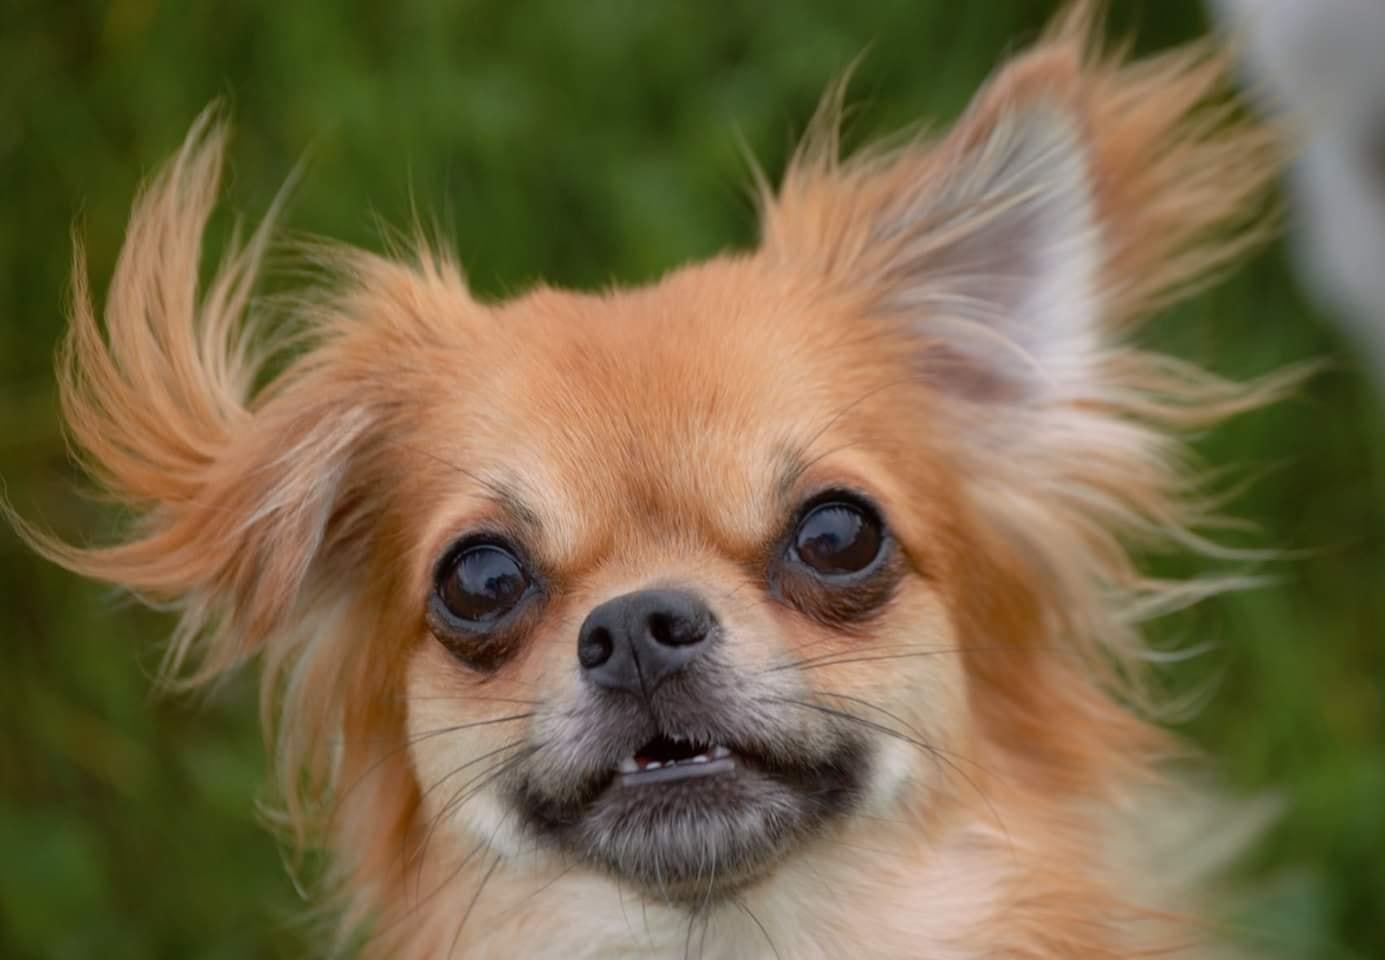 Brachycephalic Airway Syndrome and Chihuahuas